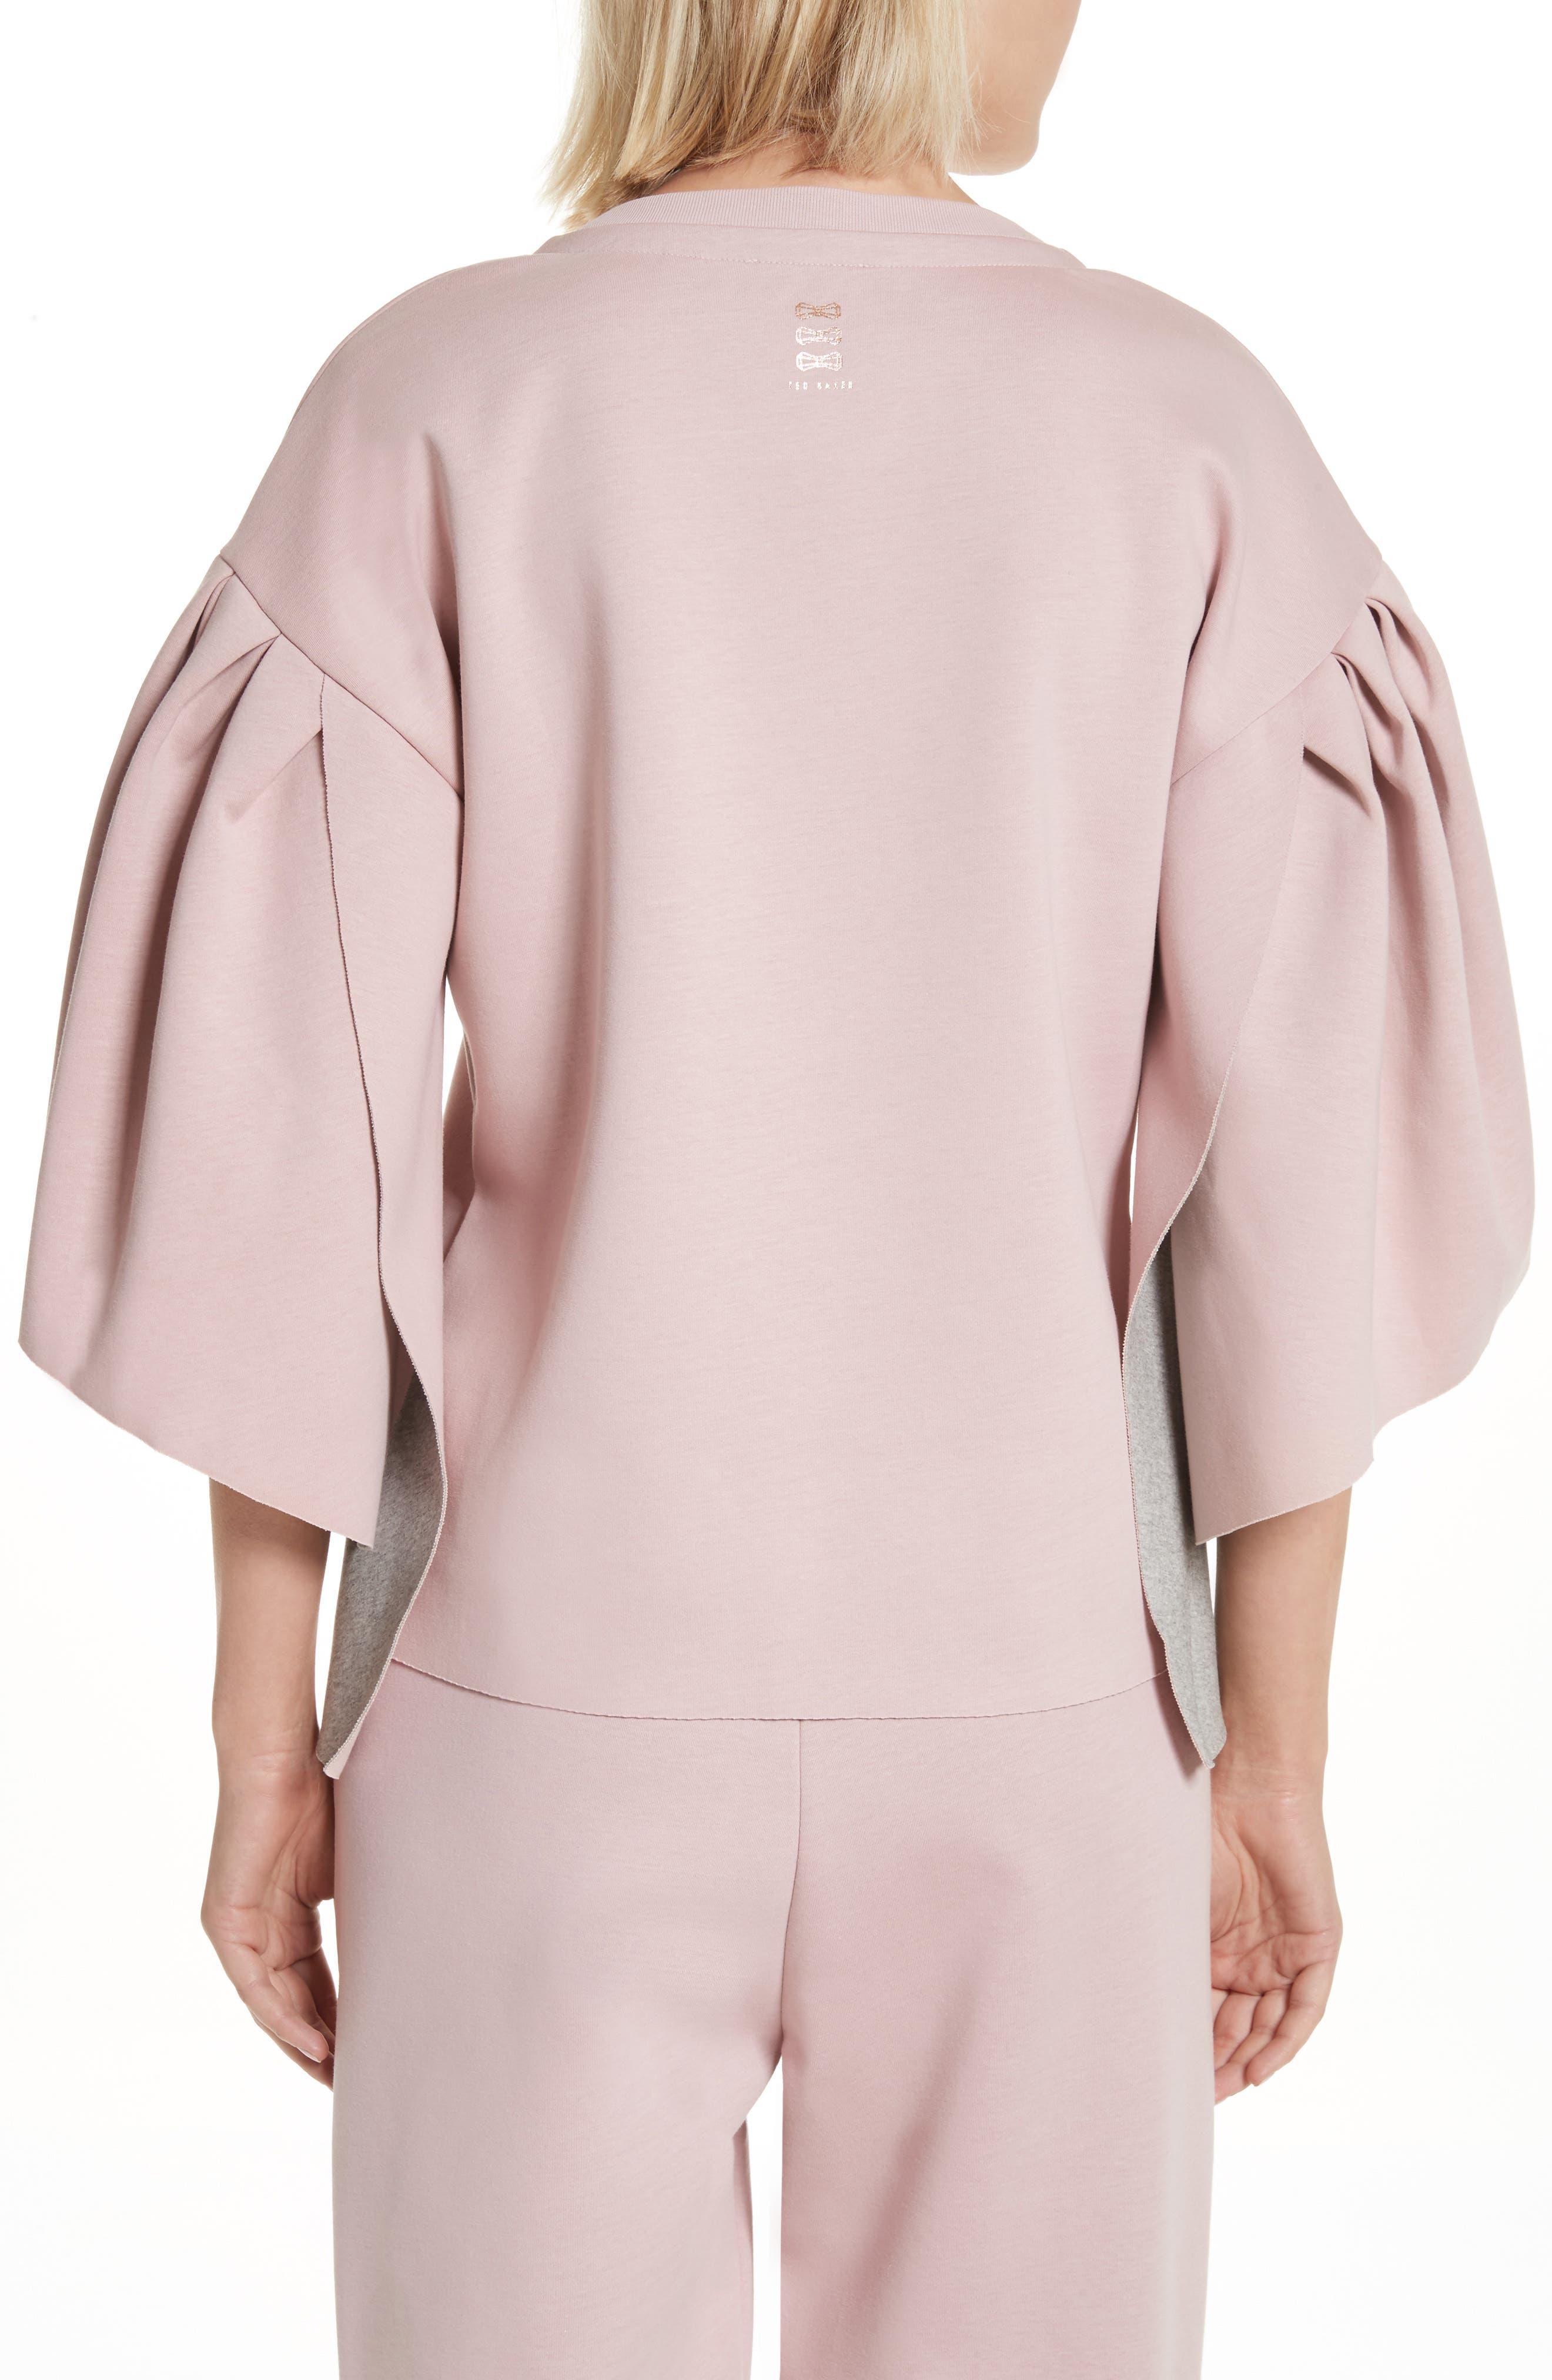 Orcher Full Sleeve Sweatshirt,                             Alternate thumbnail 2, color,                             Dusky Pink